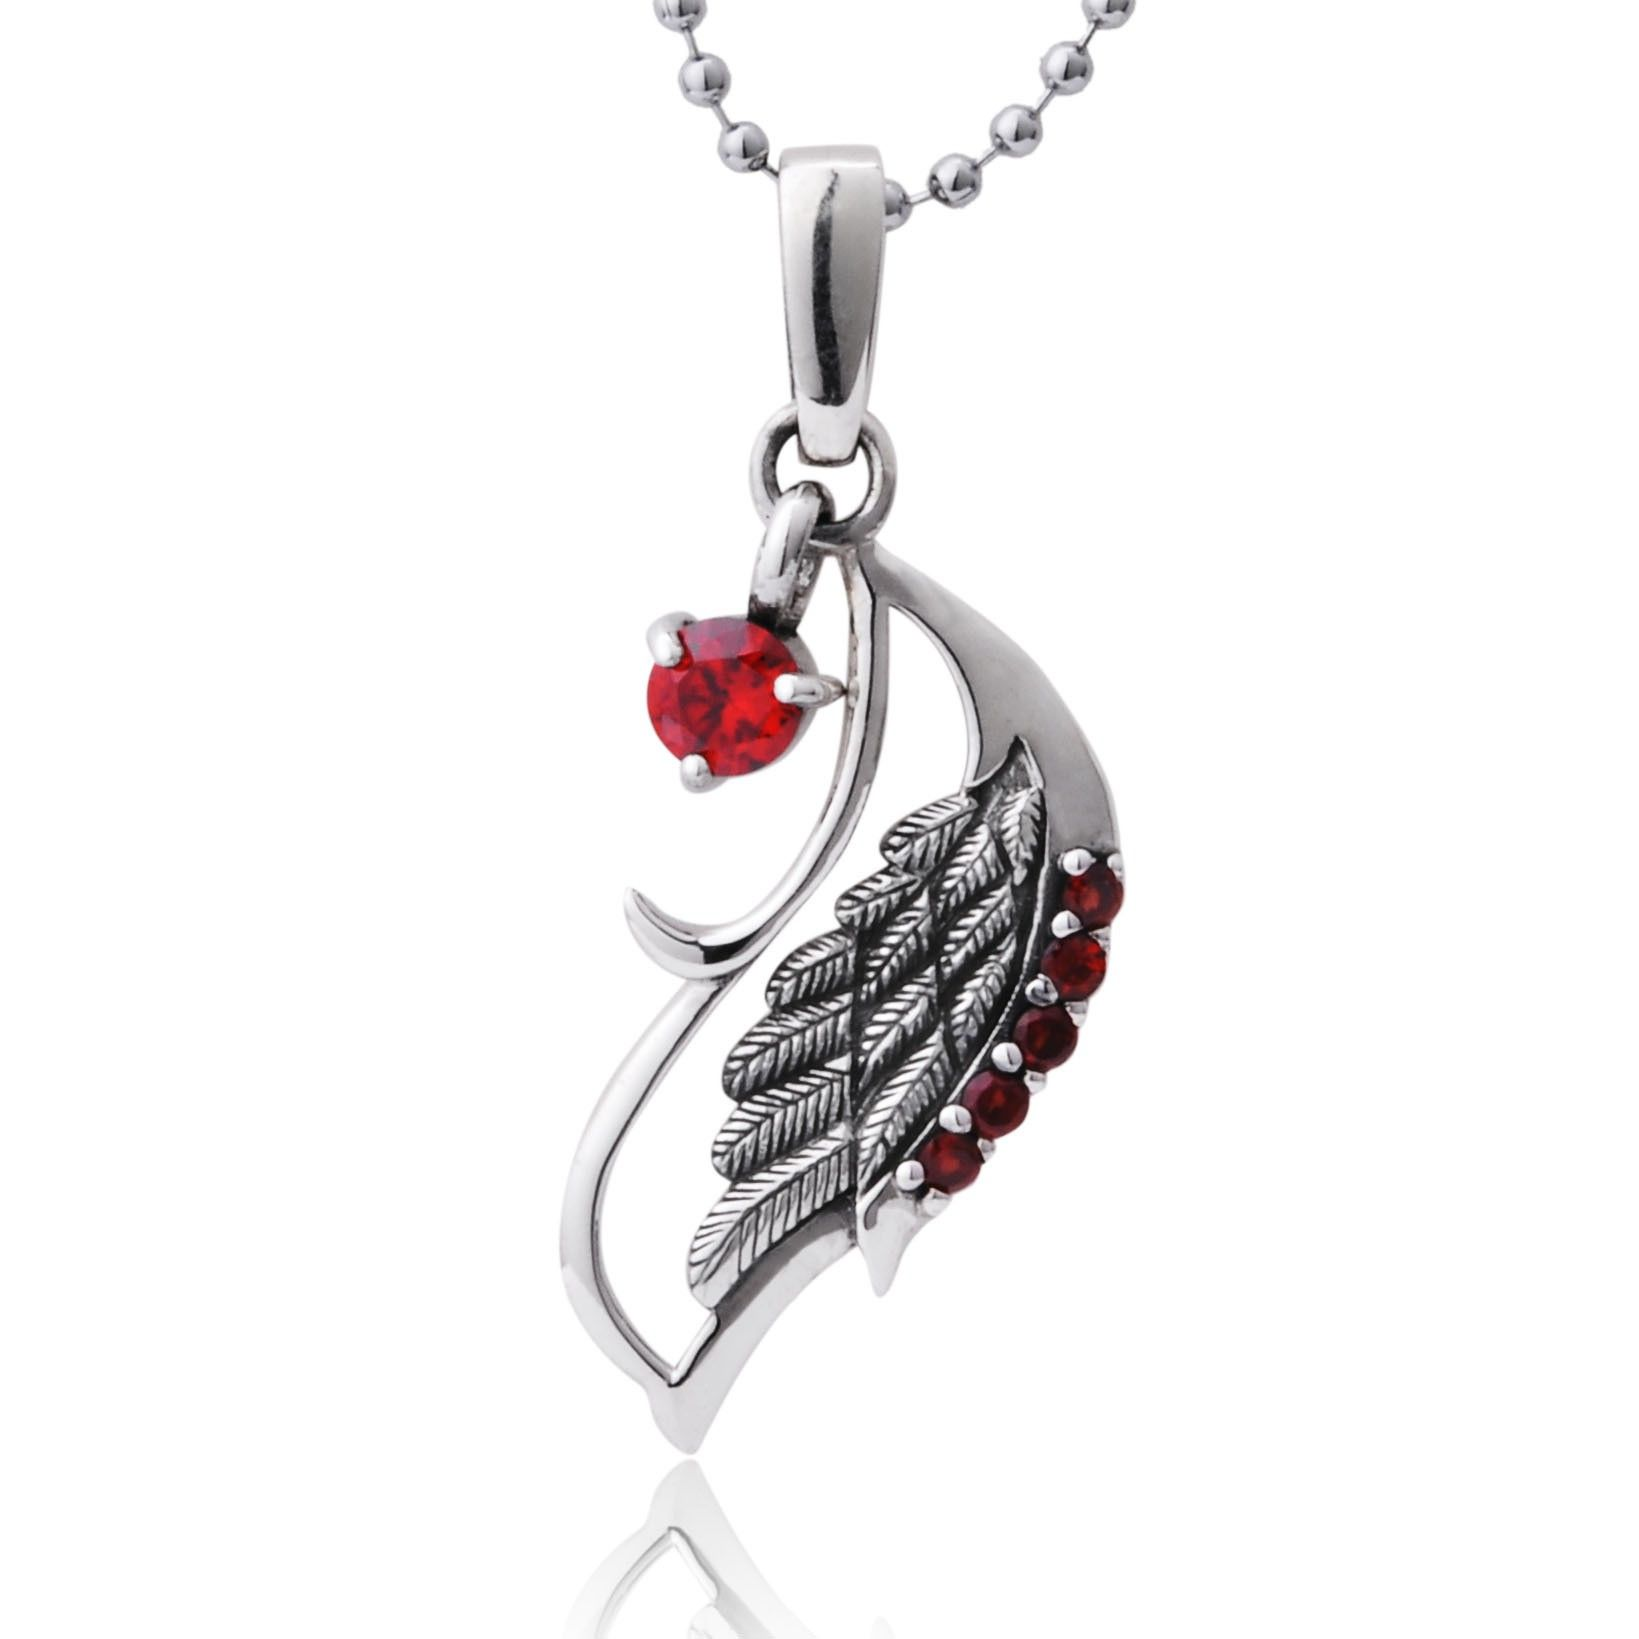 Peacock wing 925 sterling silver diamond pendant necklace for peacock wing 925 sterling silver diamond pendant necklace for women mozeypictures Gallery